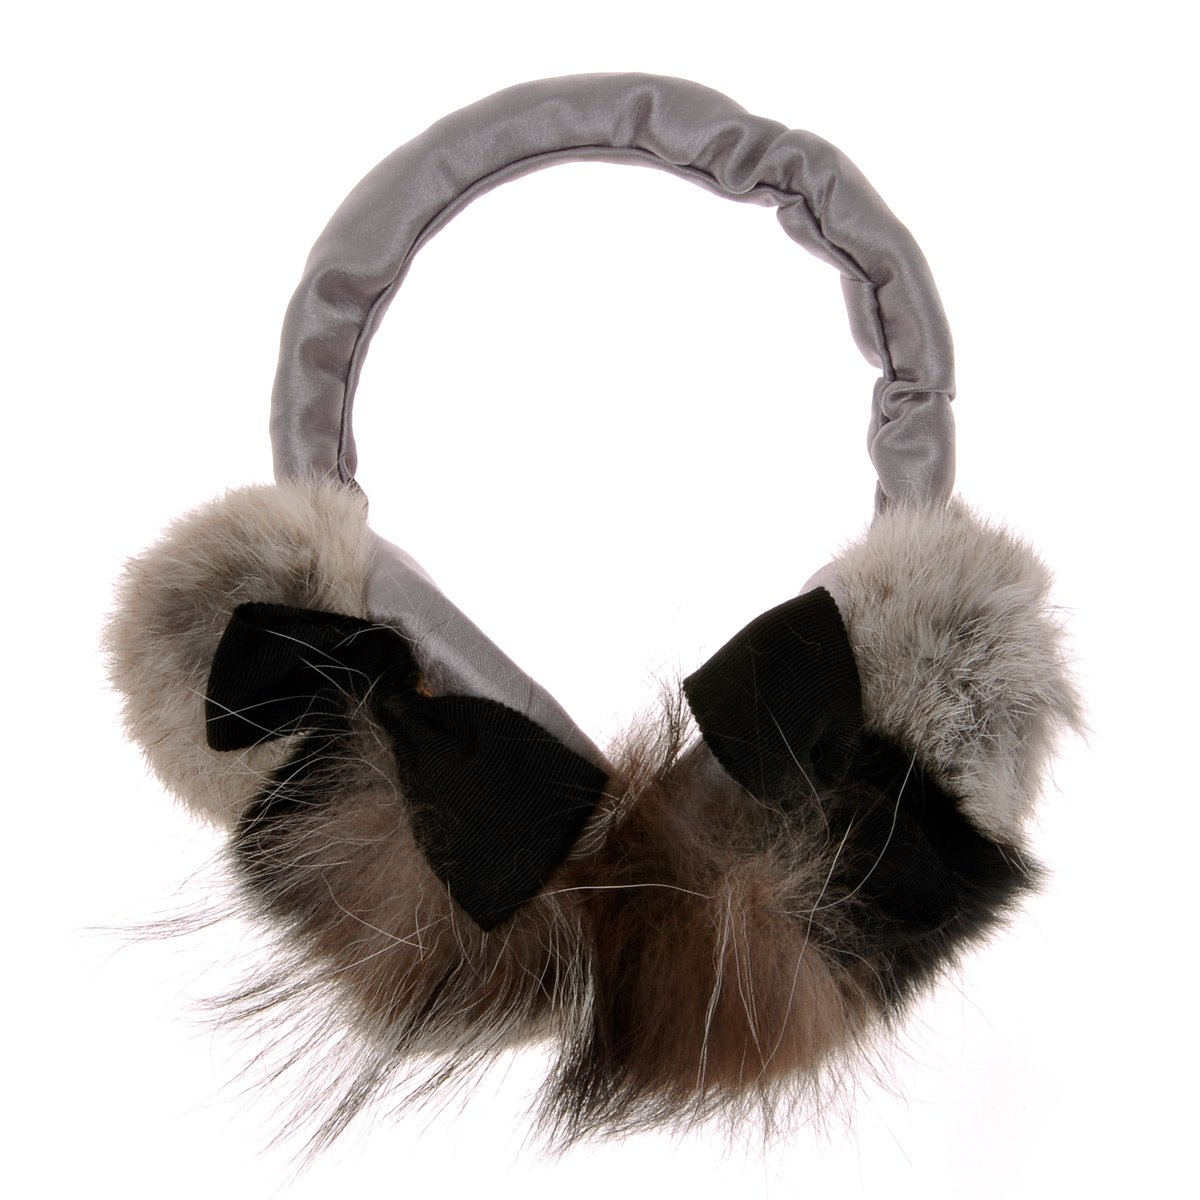 ZLYC Women Fashion Luxurious Rex Rabbit Fur Adjustable Earmuffs Bowknot Earwarmer, Gray